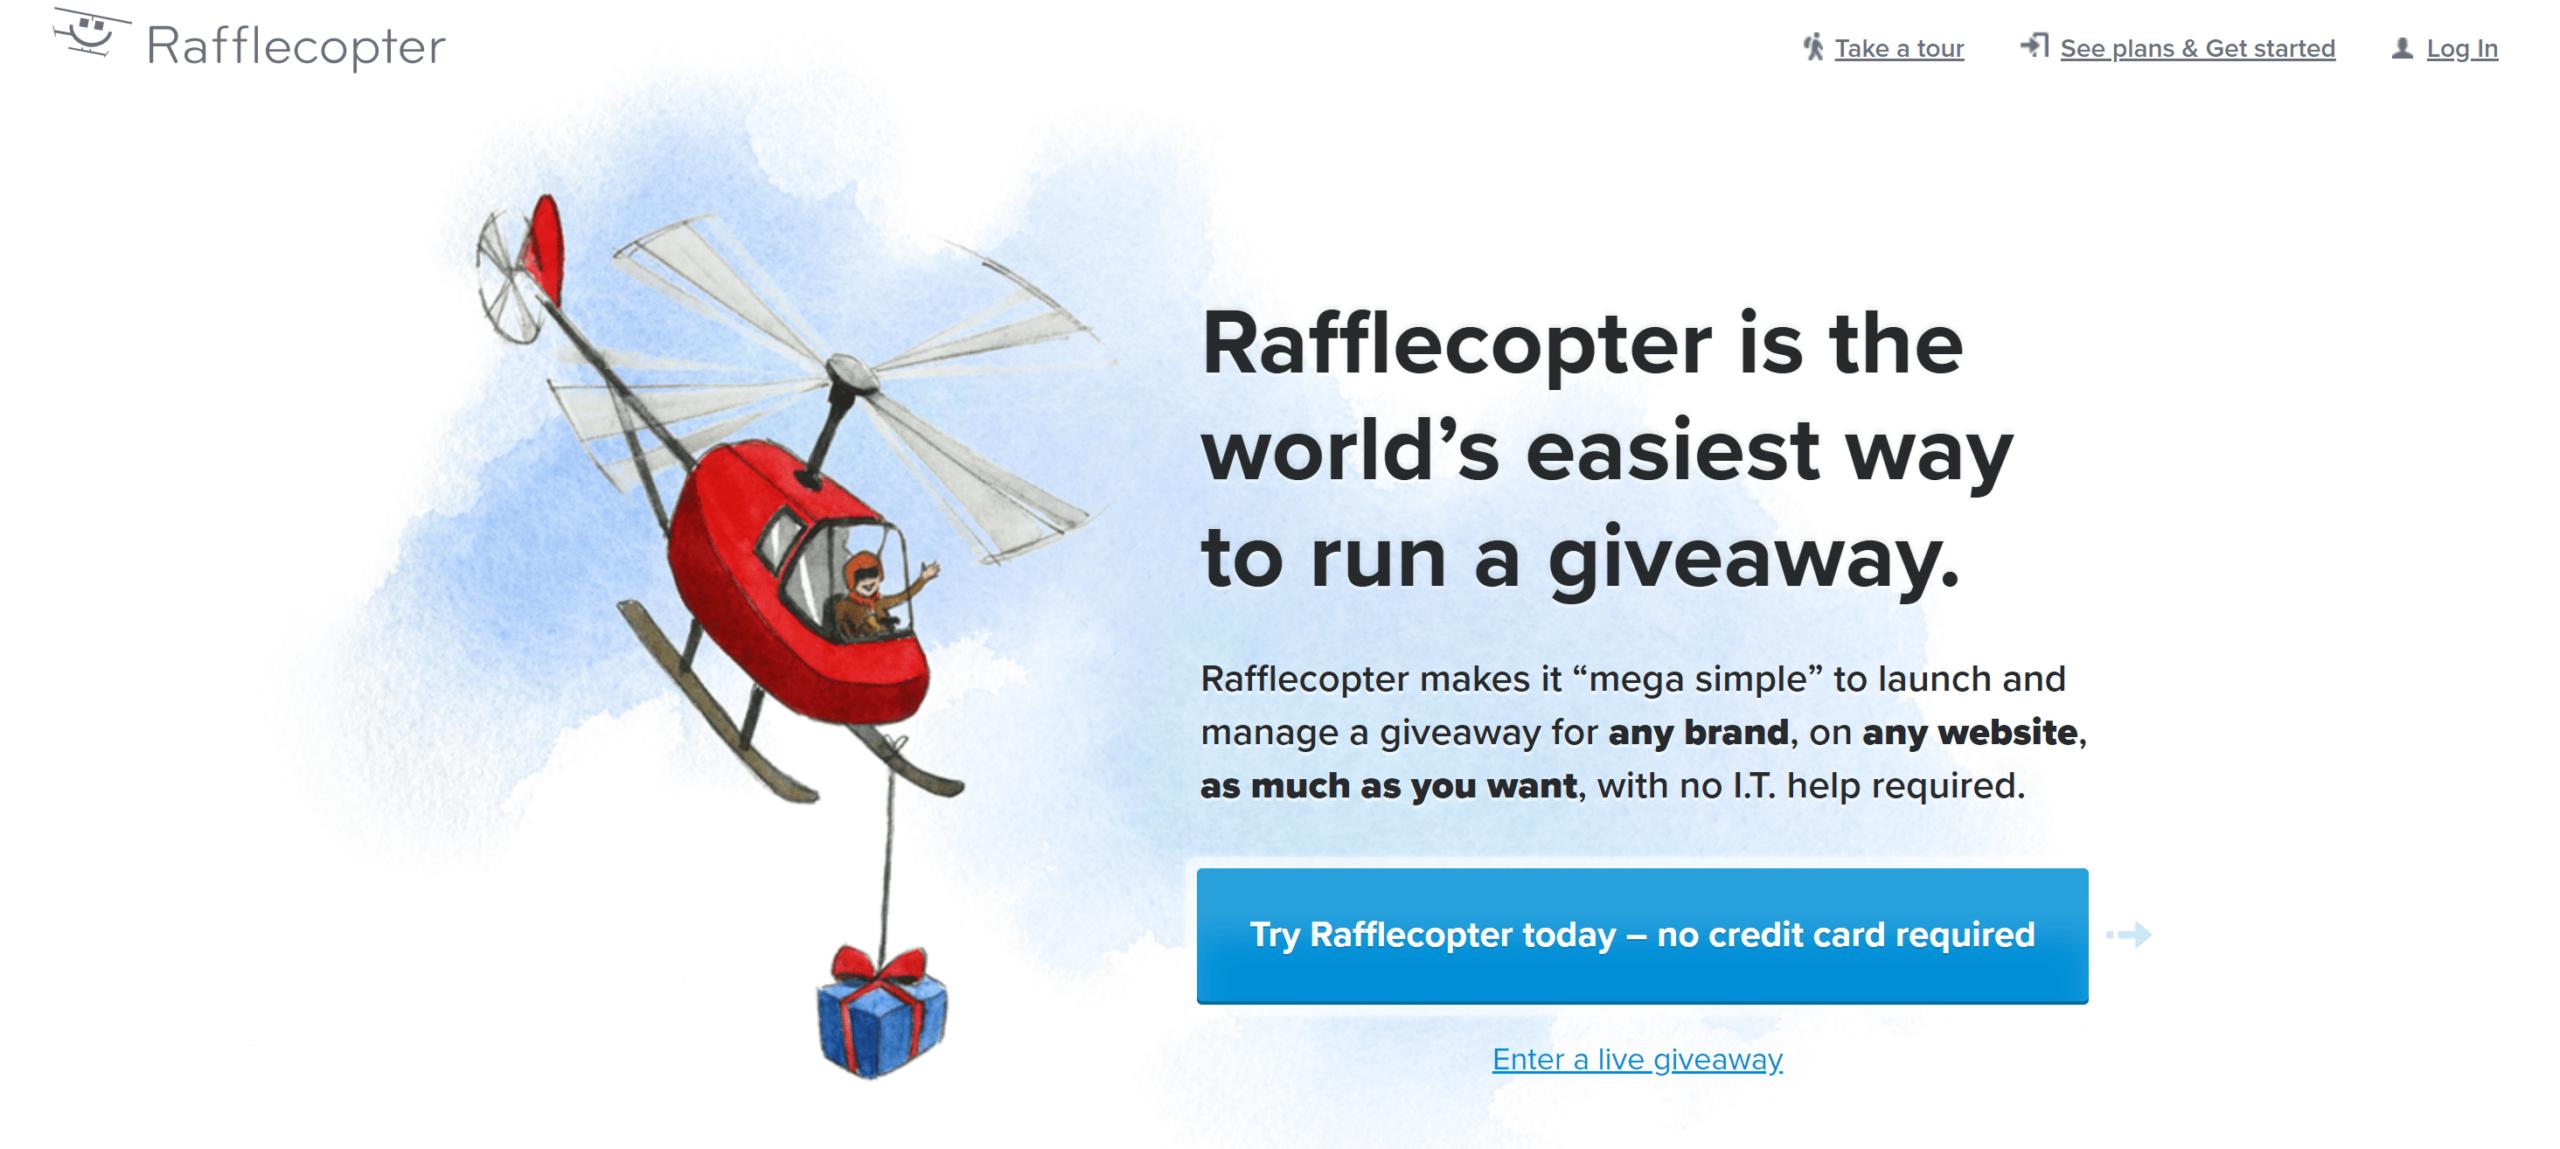 Rafflecopter review